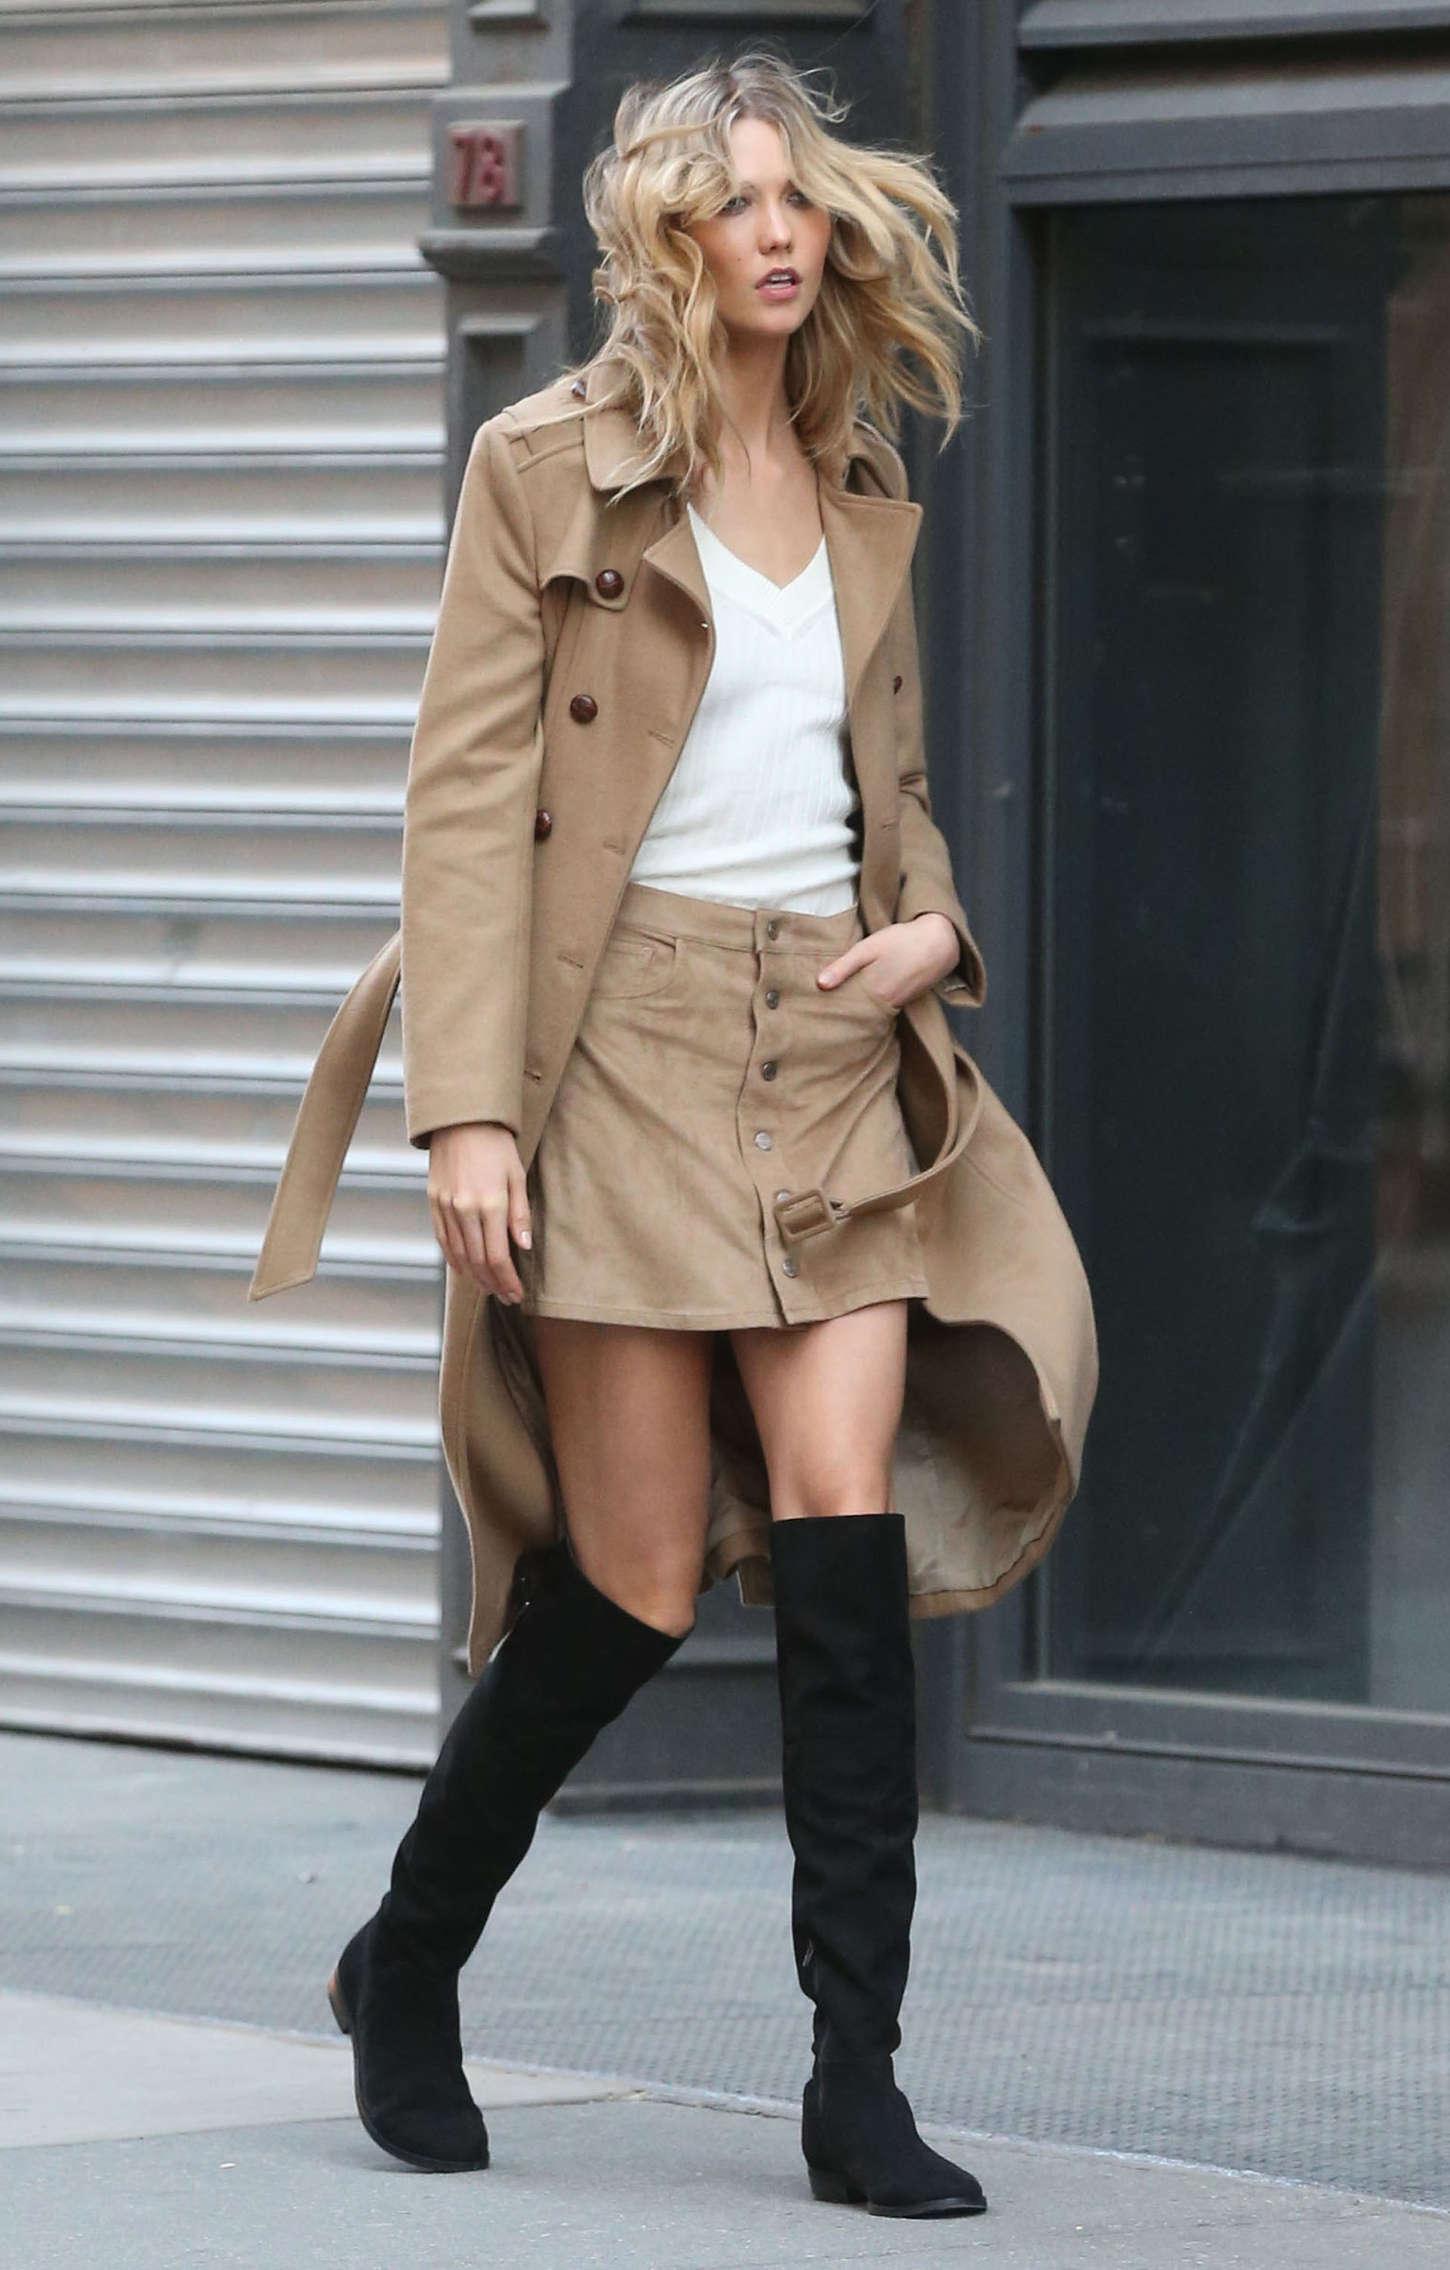 Karlie Kloss 2015 : Karlie Kloss: Photoshoot in NYC -70